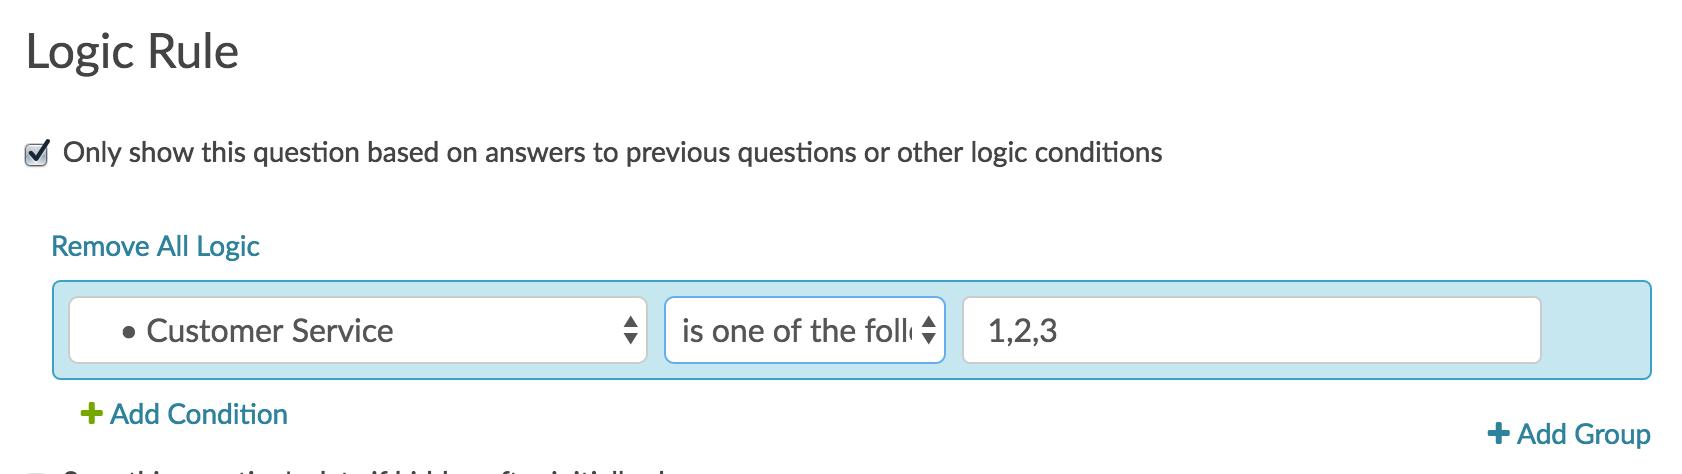 Common app essay option 5 example